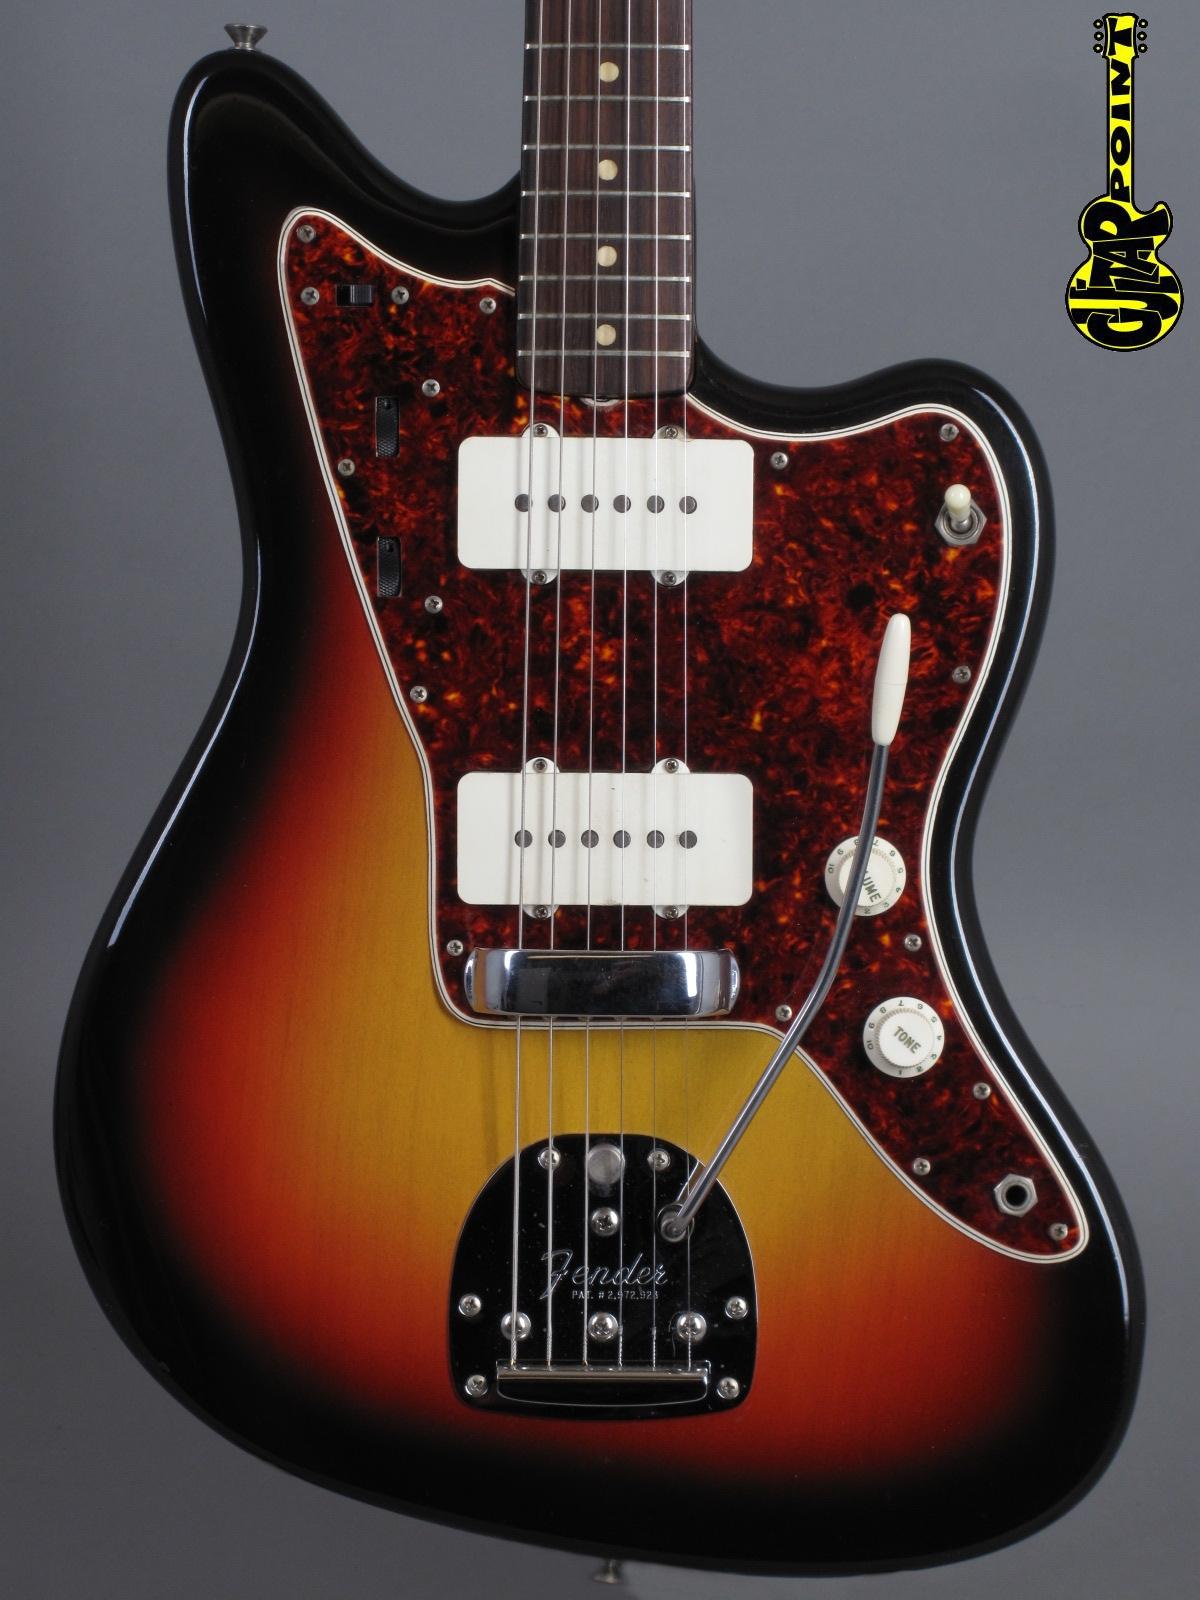 1965 Fender Jazzmaster - 3-tone Sunburst  incl. hangtags!